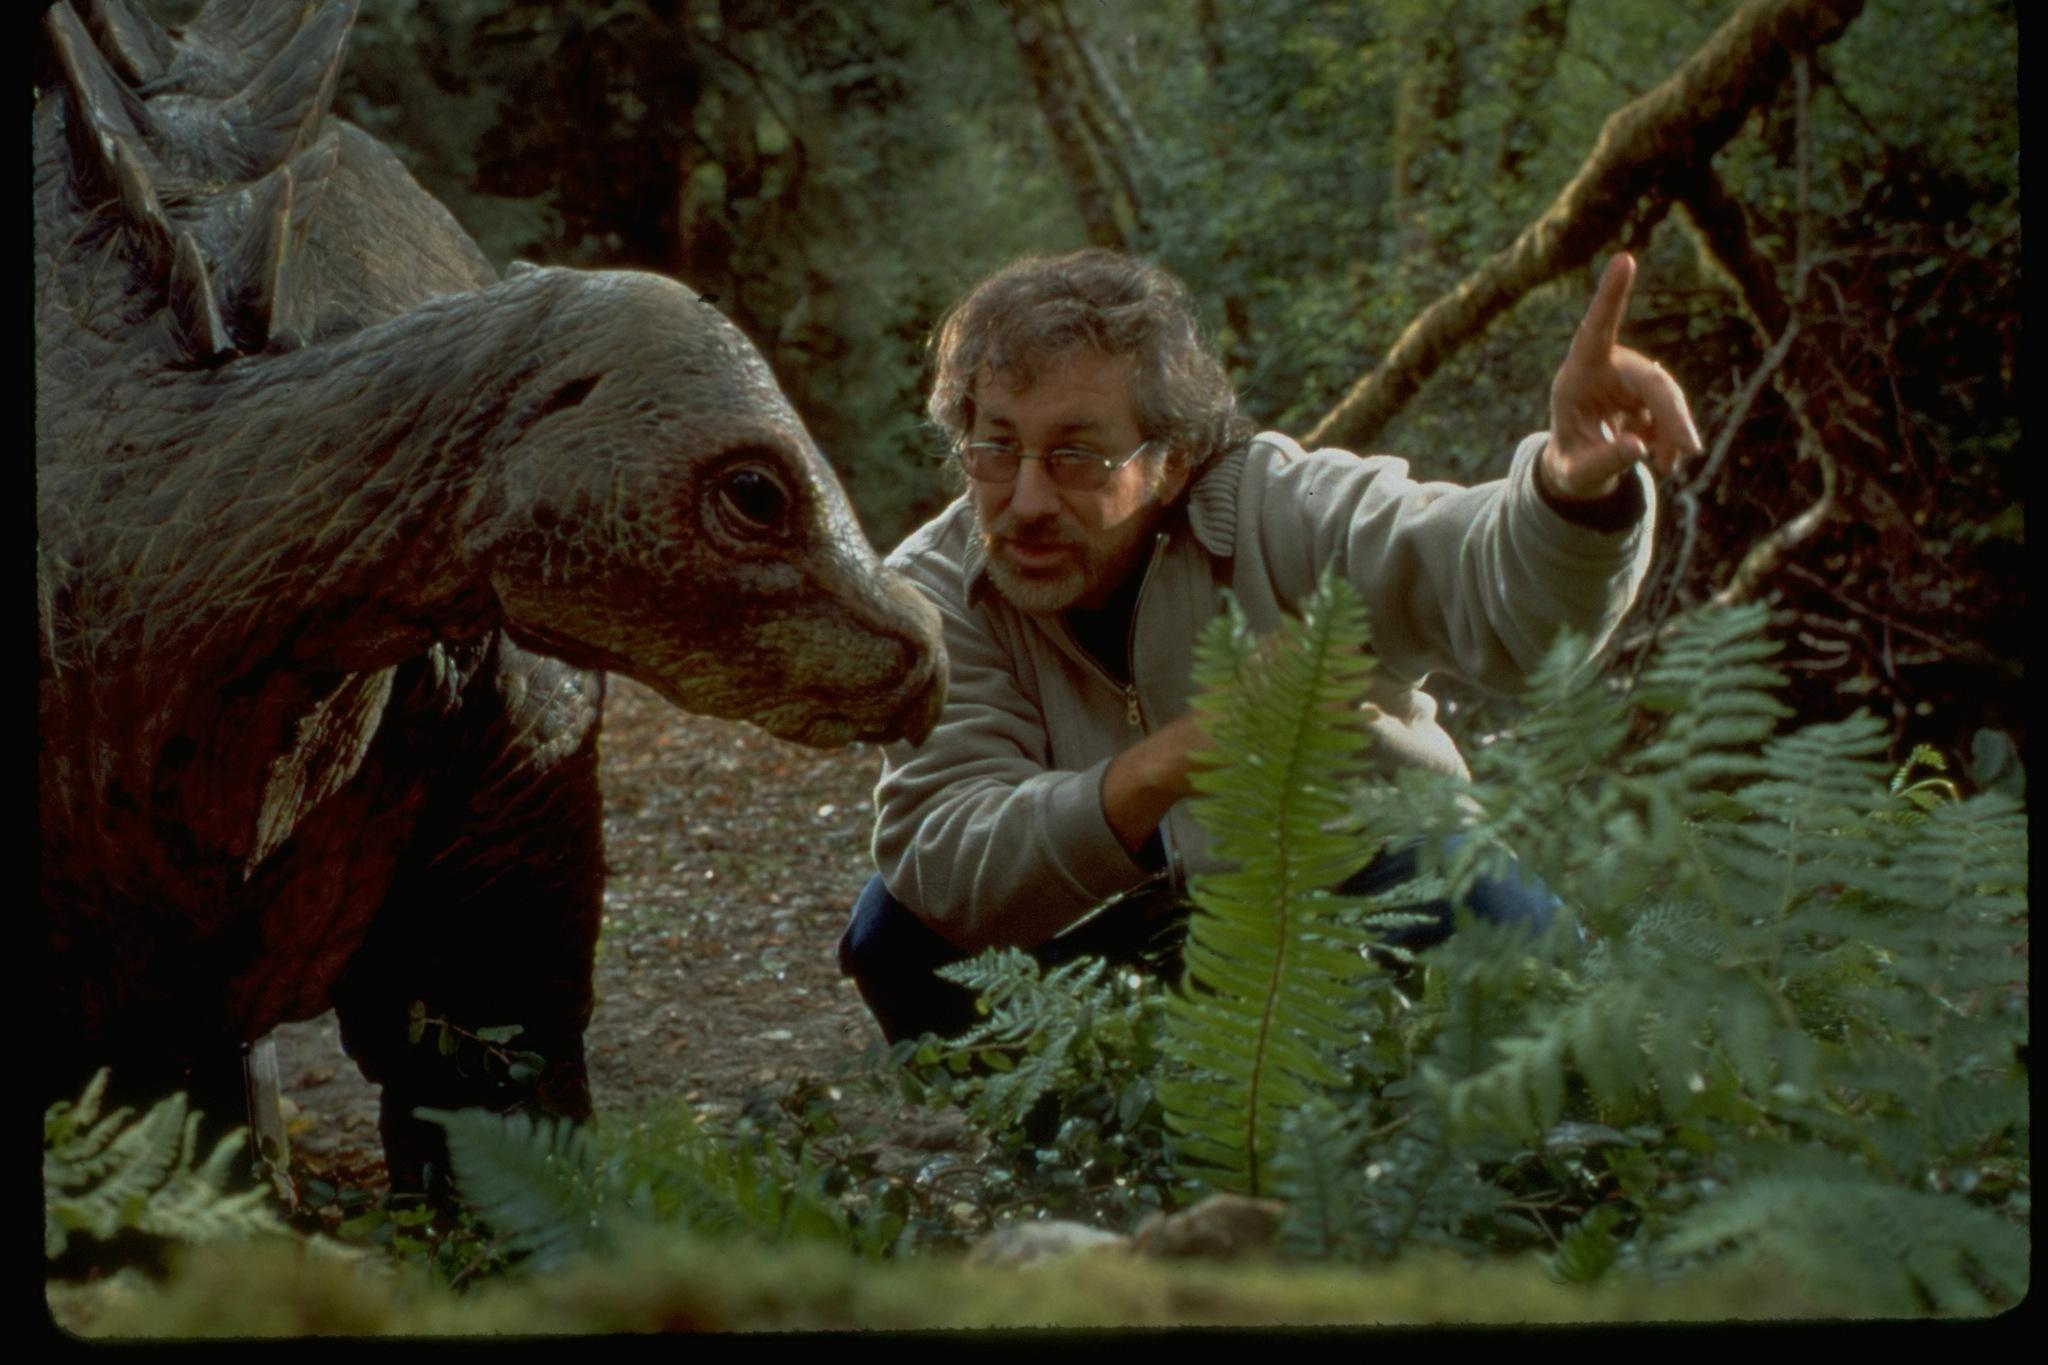 Steven Spielberg in The Lost World: Jurassic Park (1997)